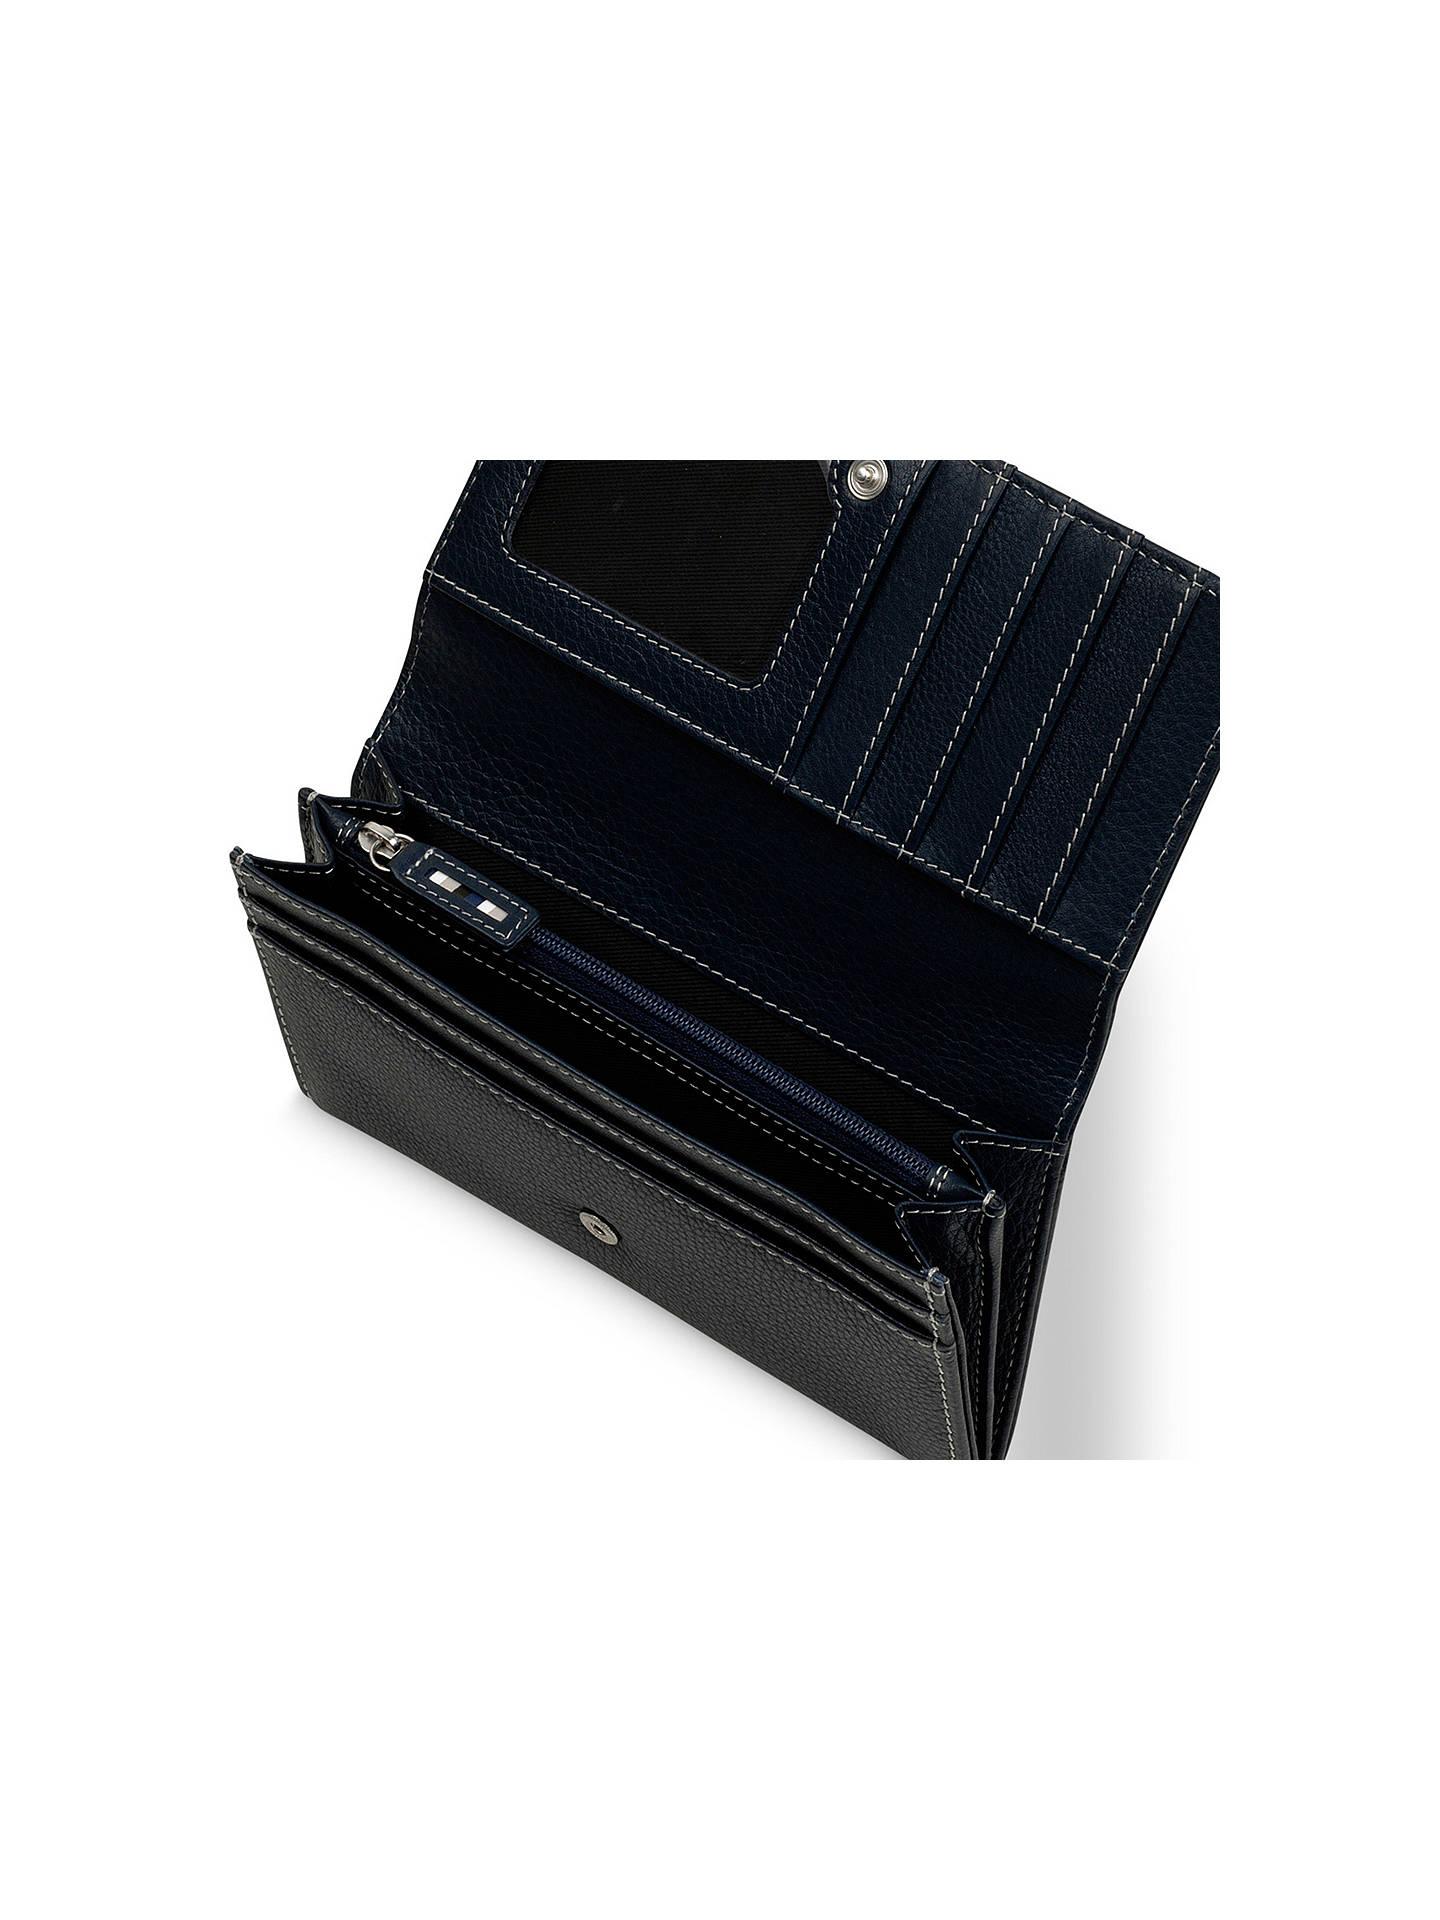 83f4481e19c ... BuyTula Mallory Leather Large Flapover Matinee Purse, Dark Azure Online  at johnlewis.com ...